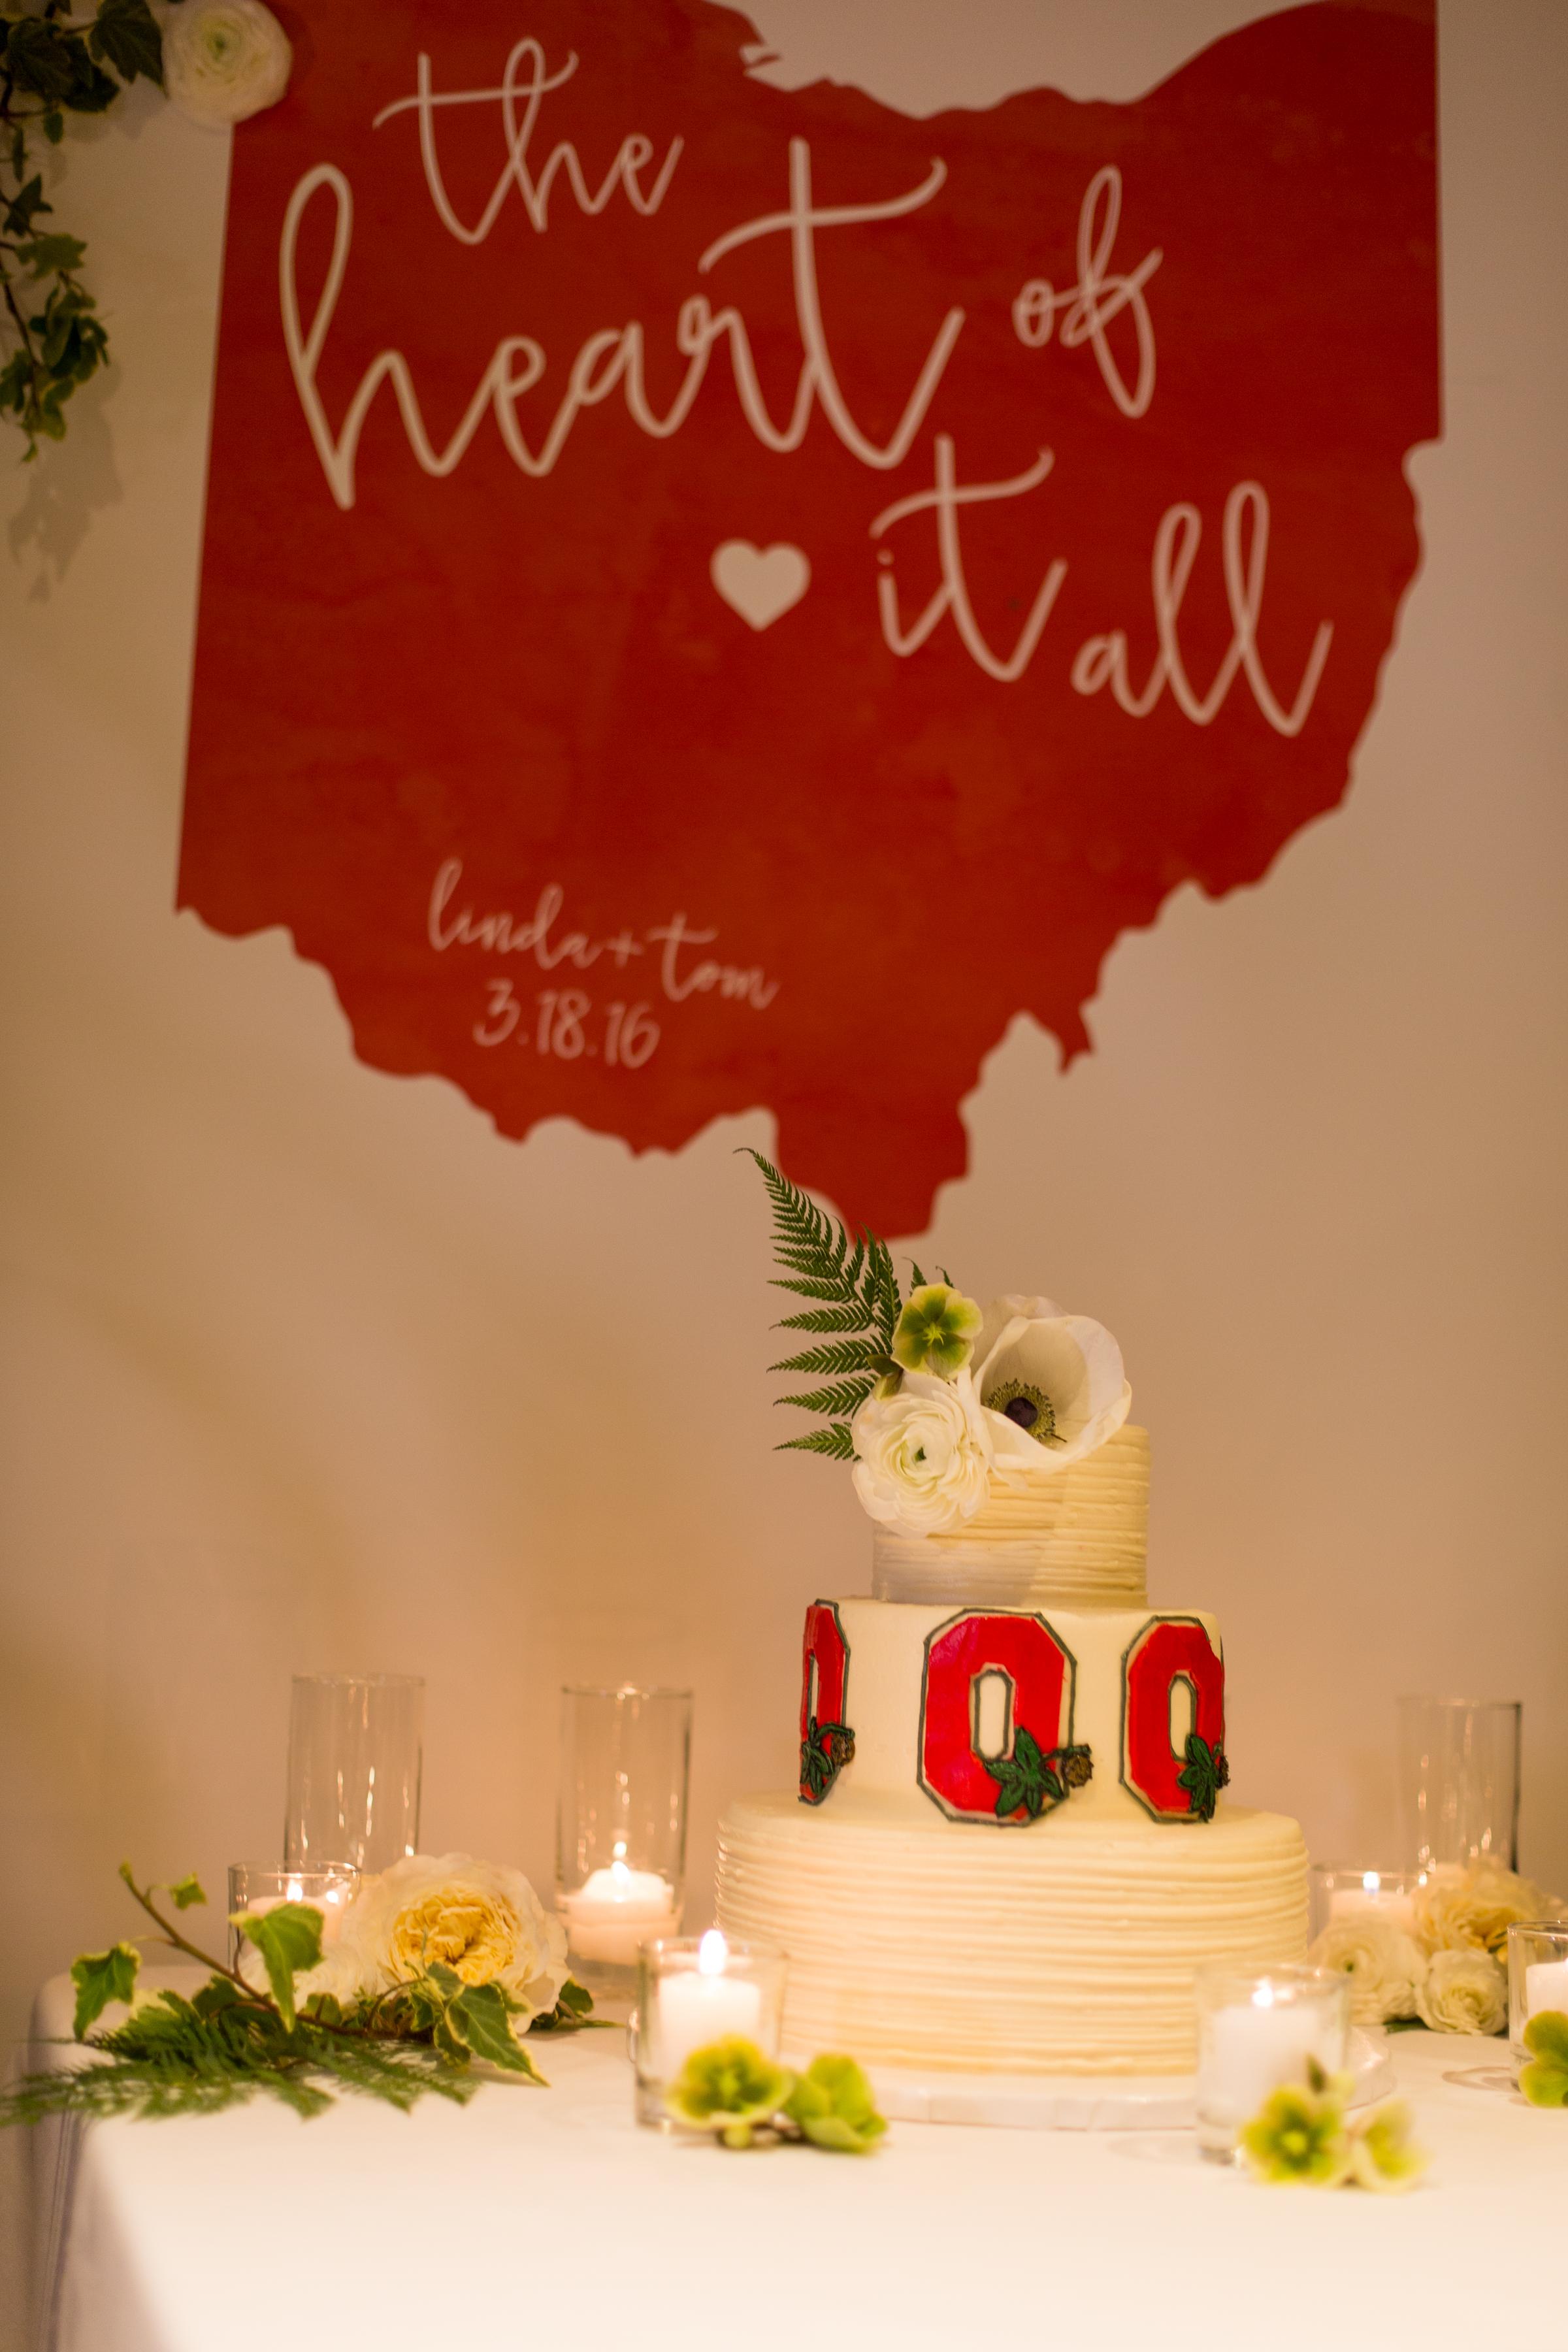 049 - cake display.jpg